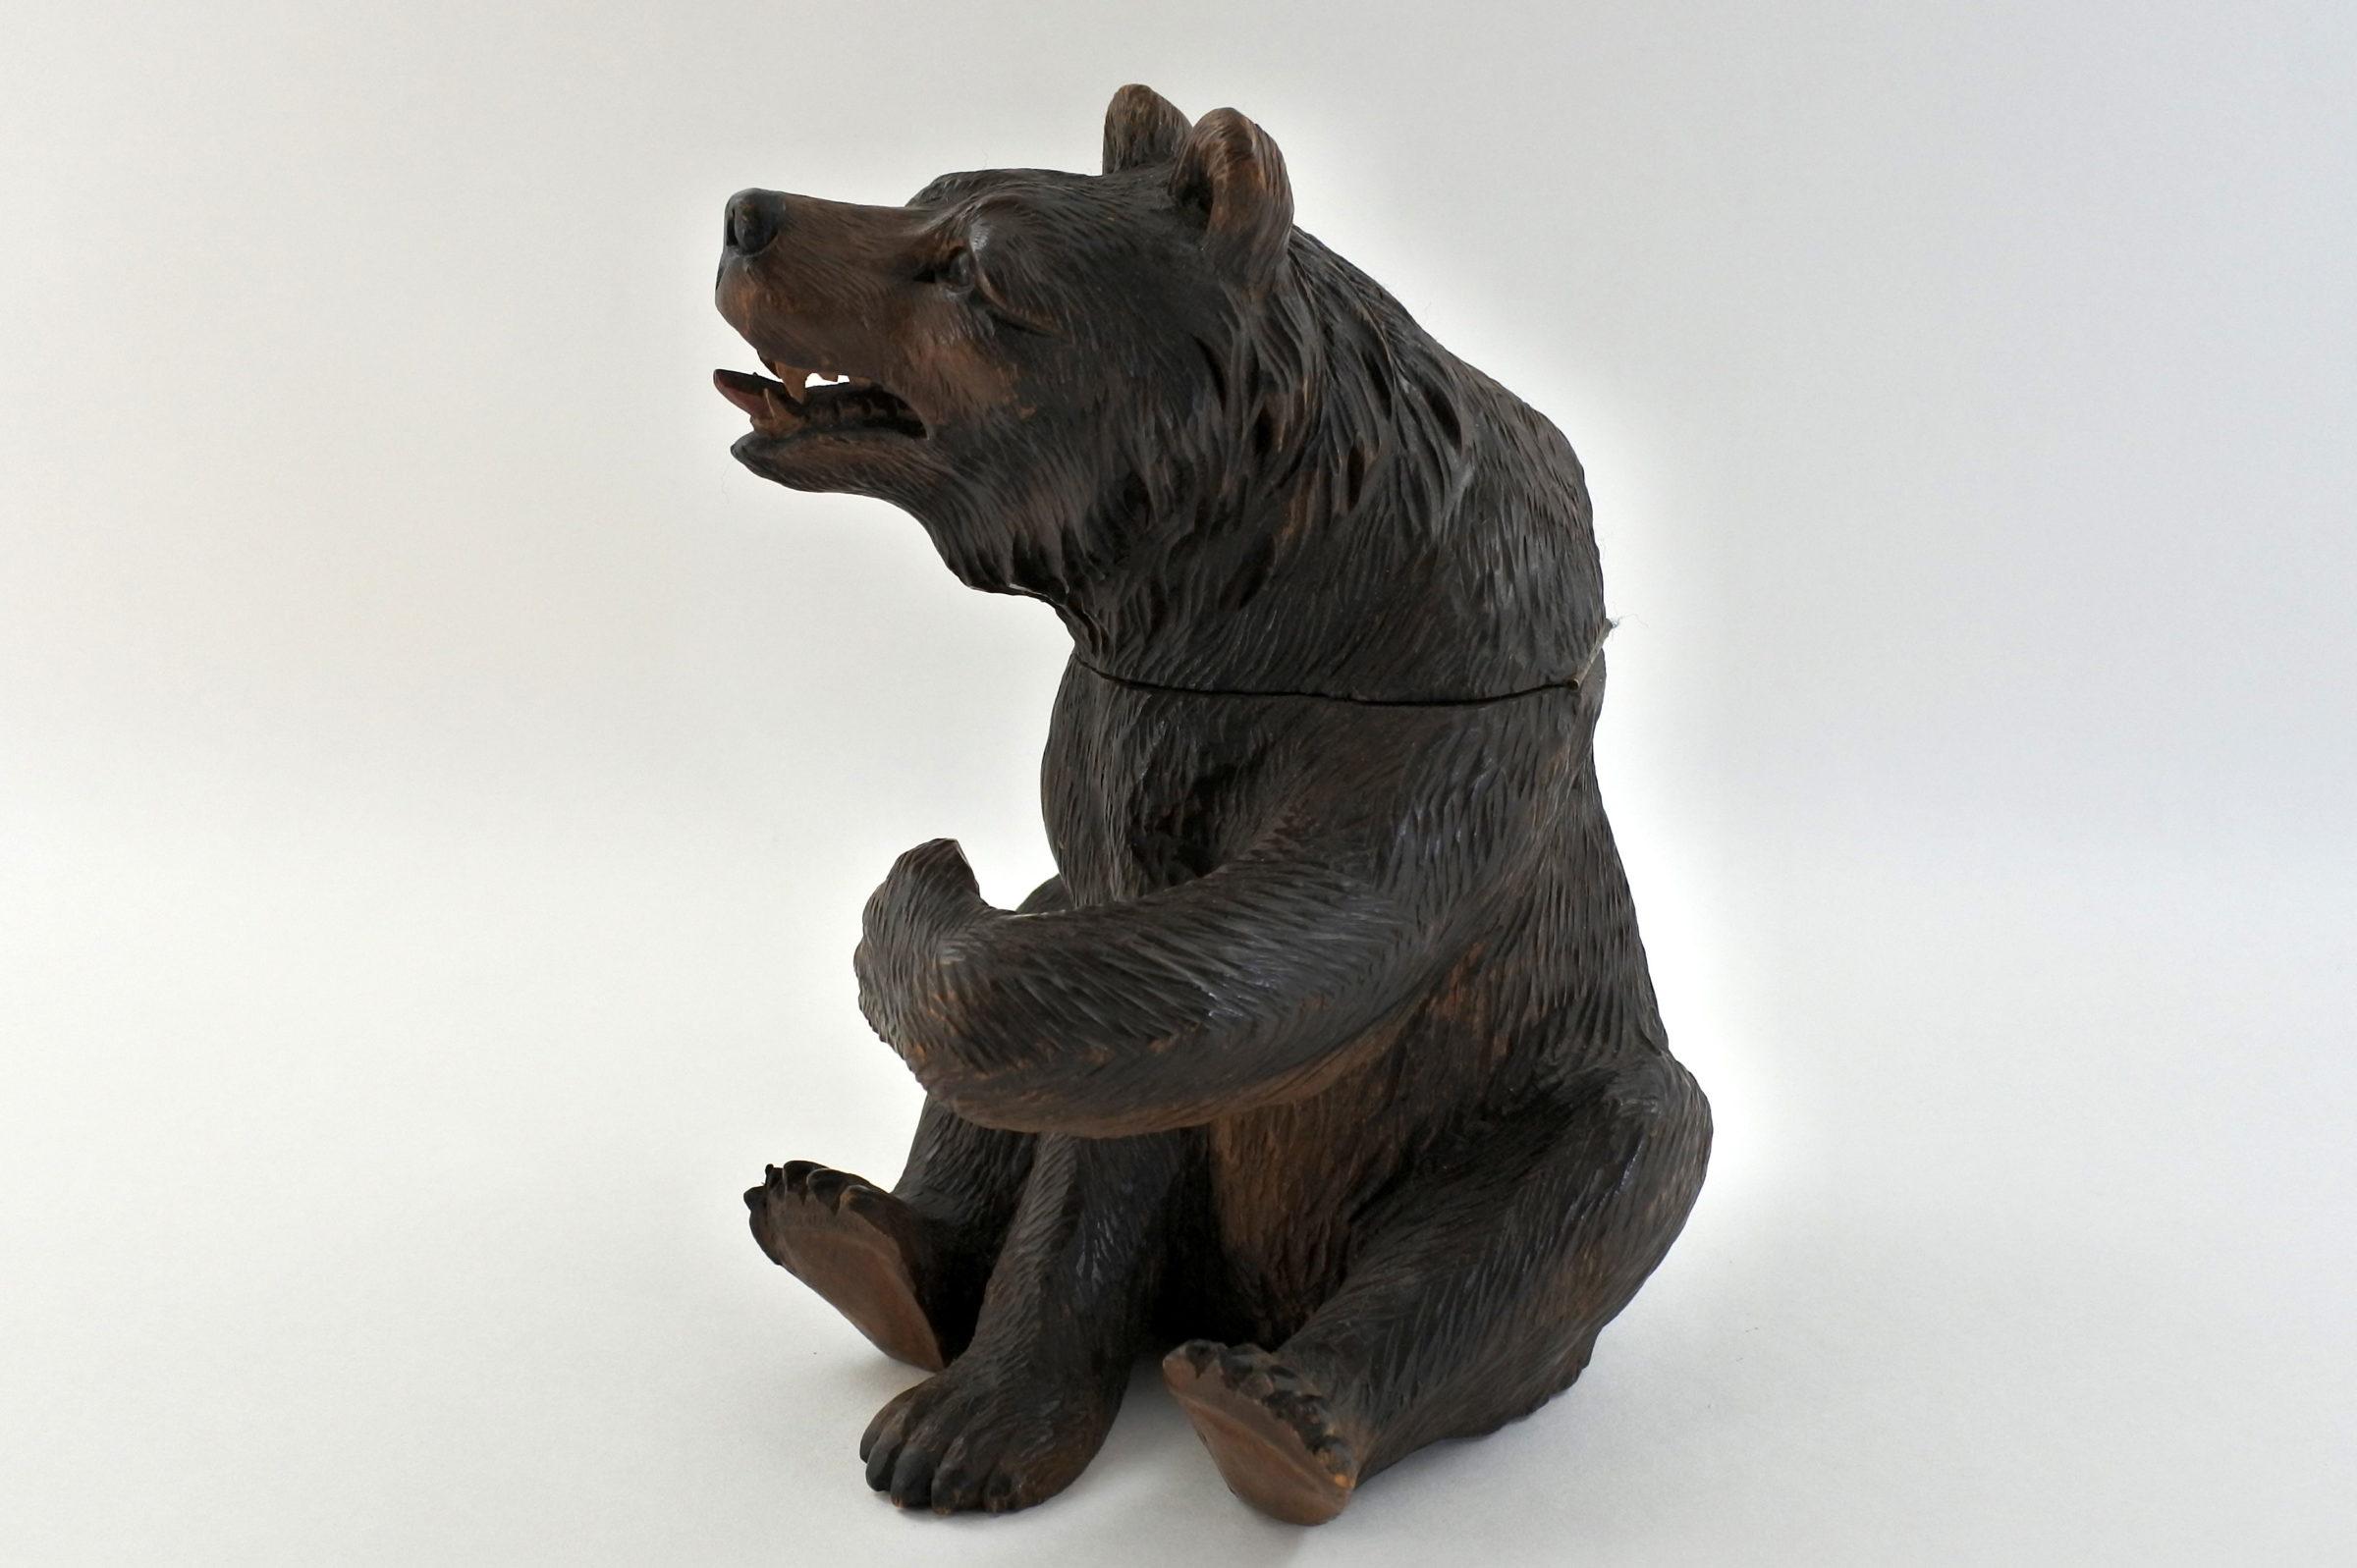 Calamaio foresta nera a forma di orso - 3